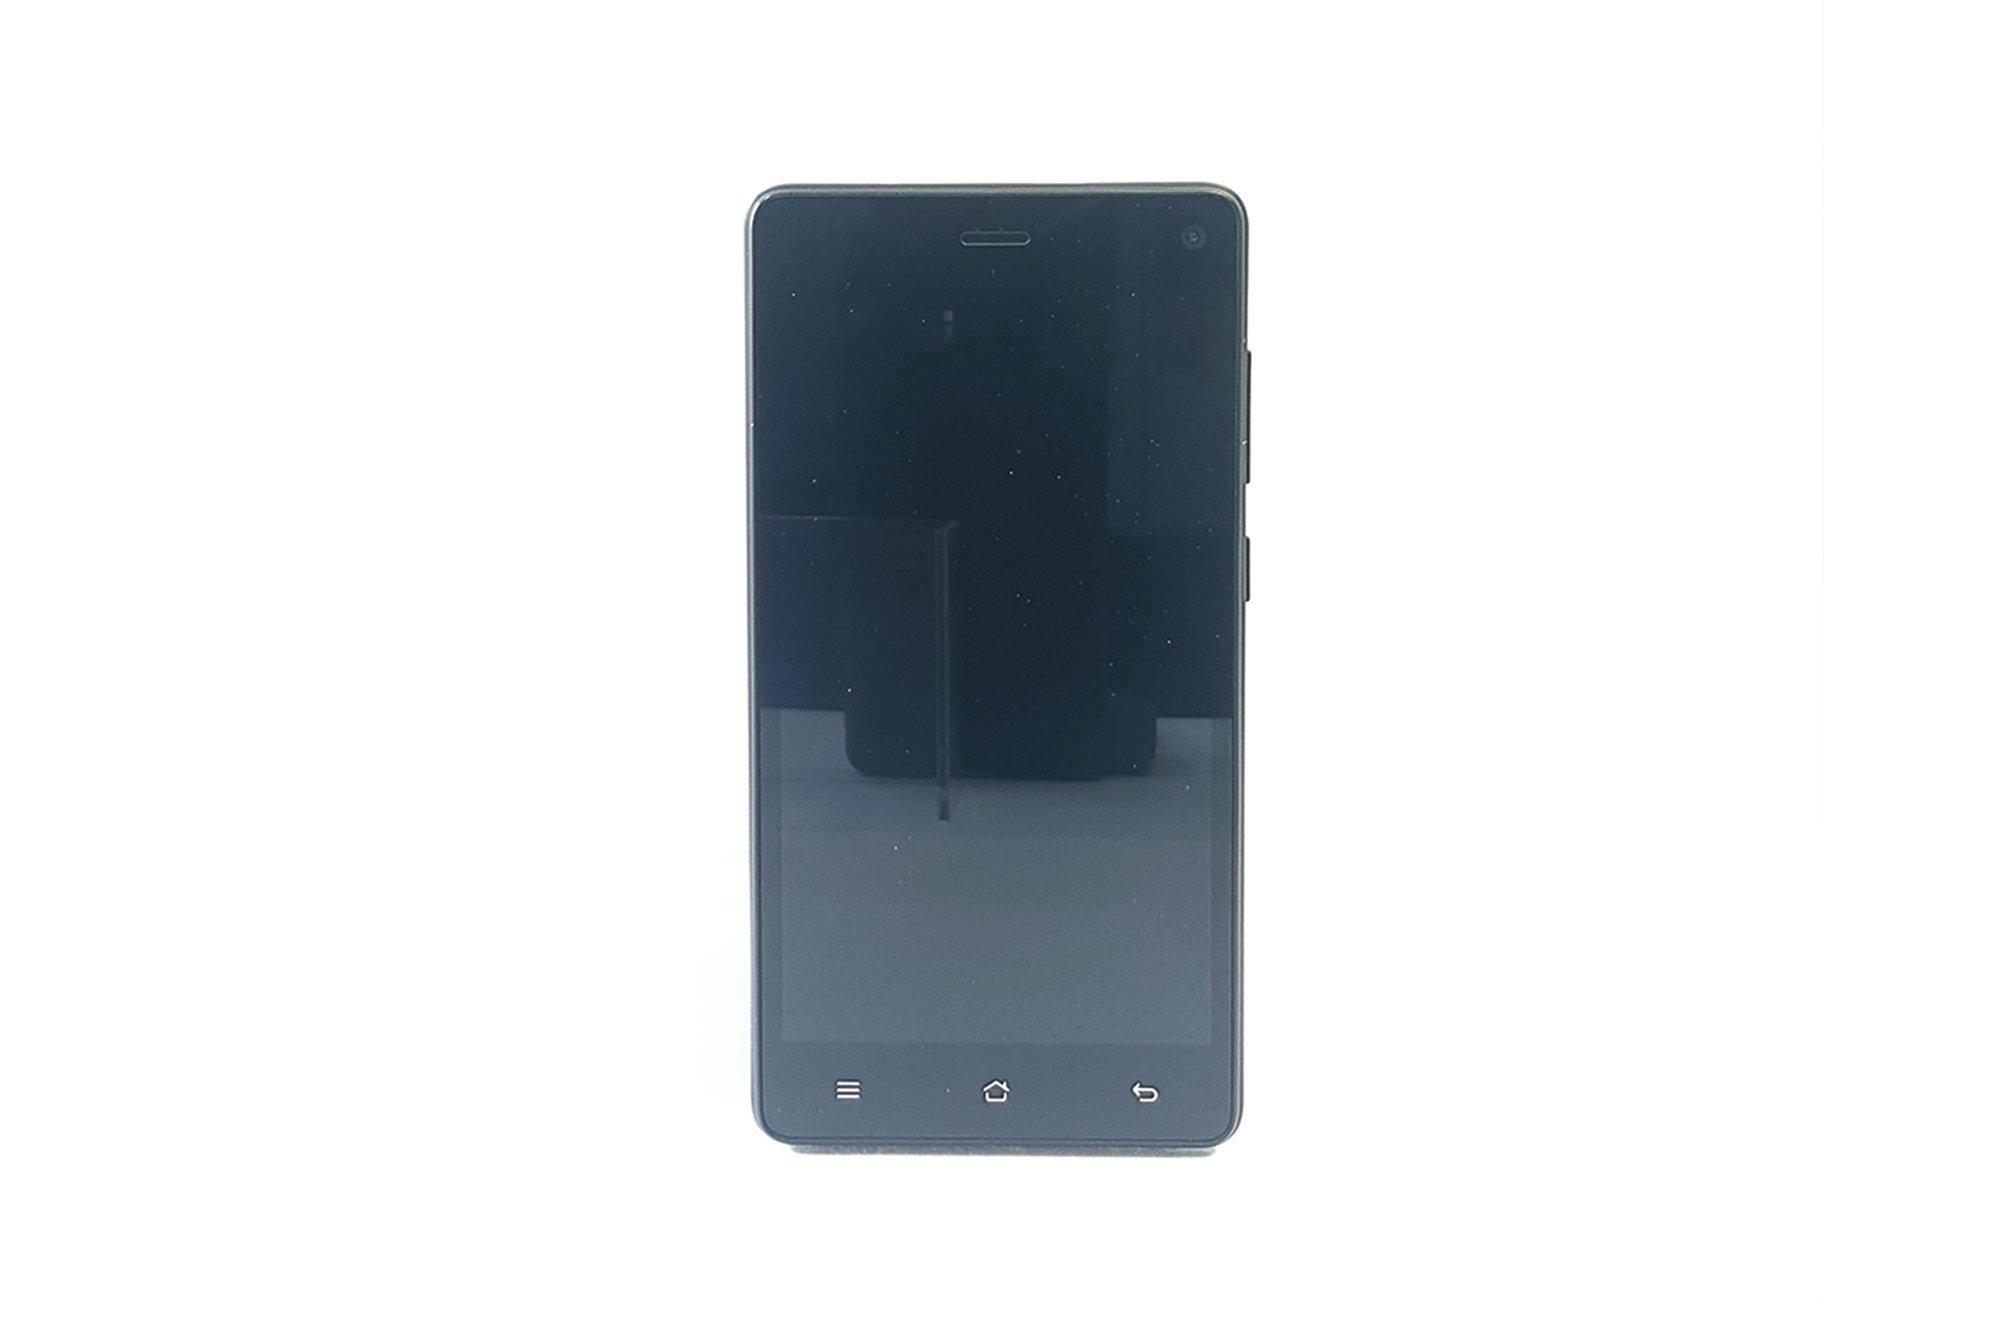 Smartphone Medion Life E5001 8GB Black Damaged